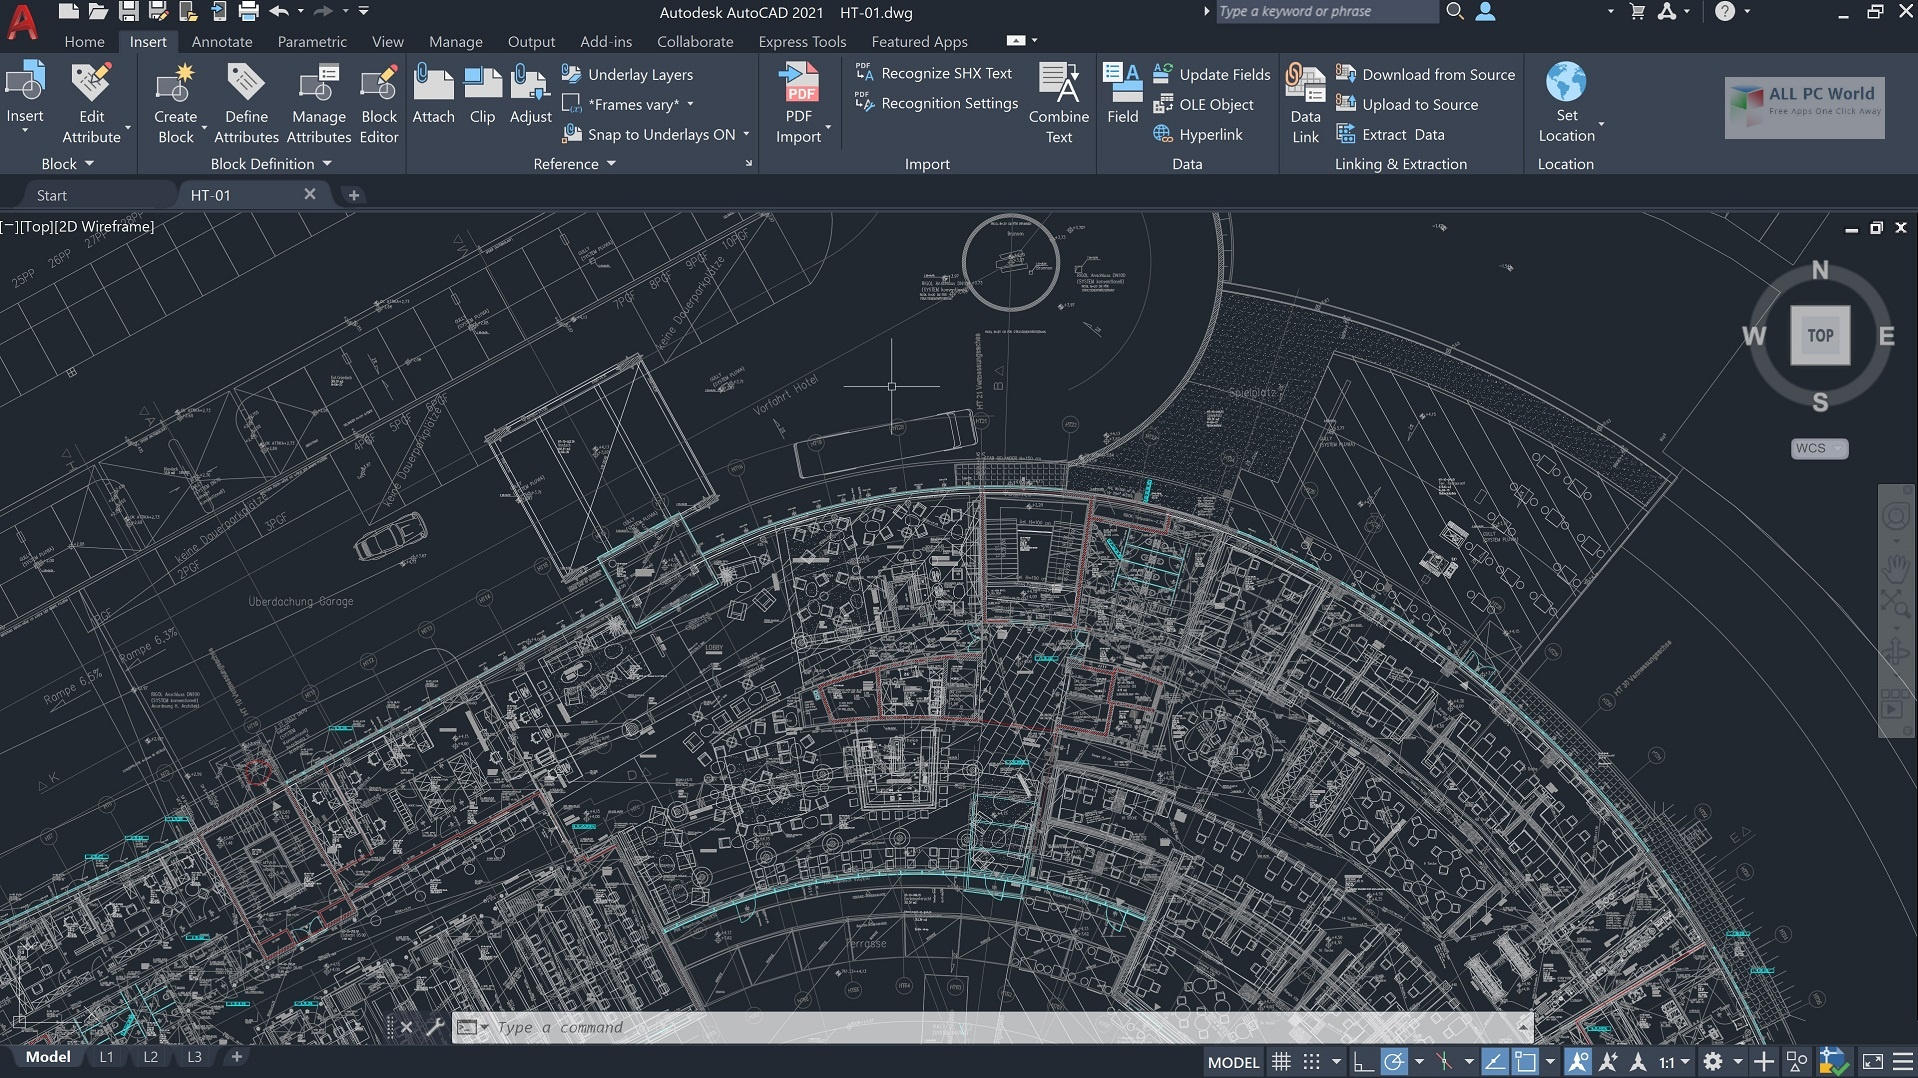 Autodesk AutoCAD Architecture 2021 Free Download